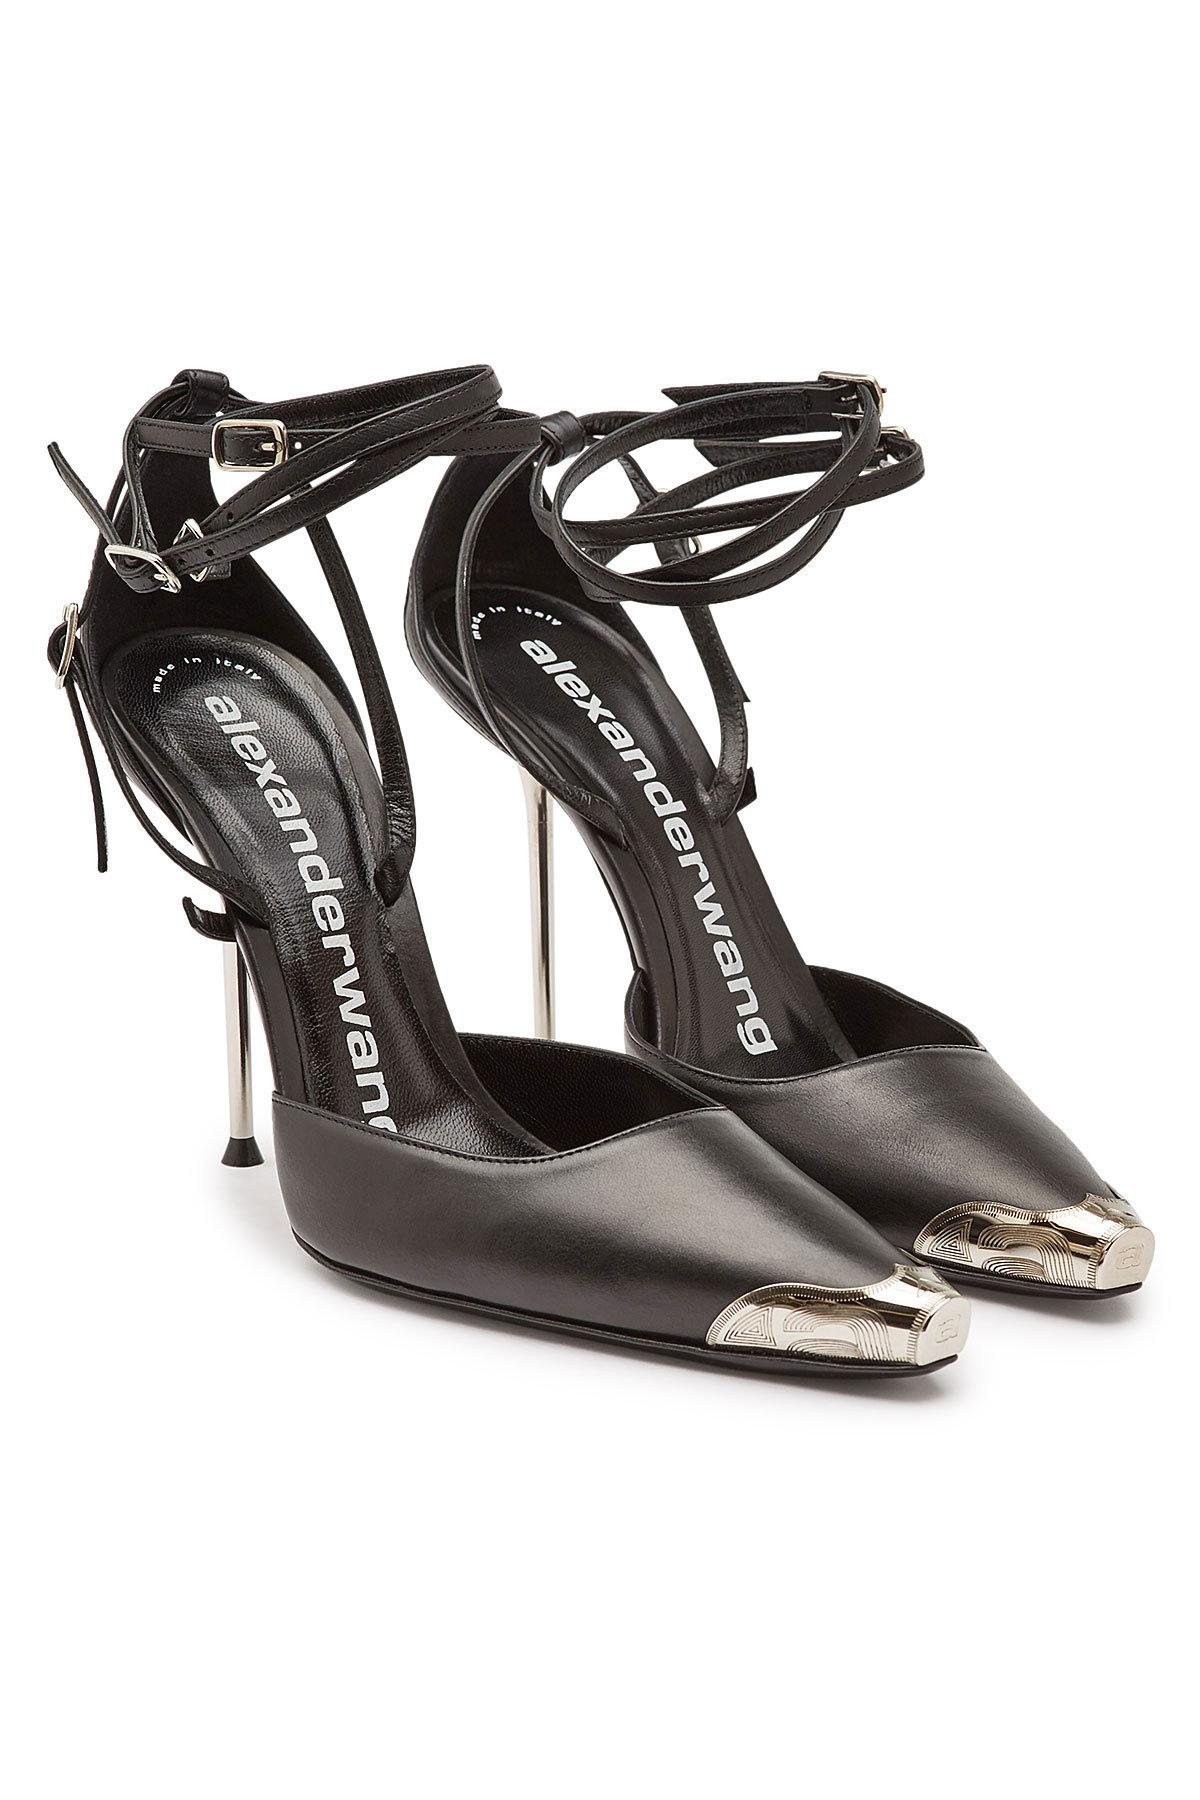 805582964 Lyst - Alexander Wang Leather Selena Ankle Strap Stilettos in Black